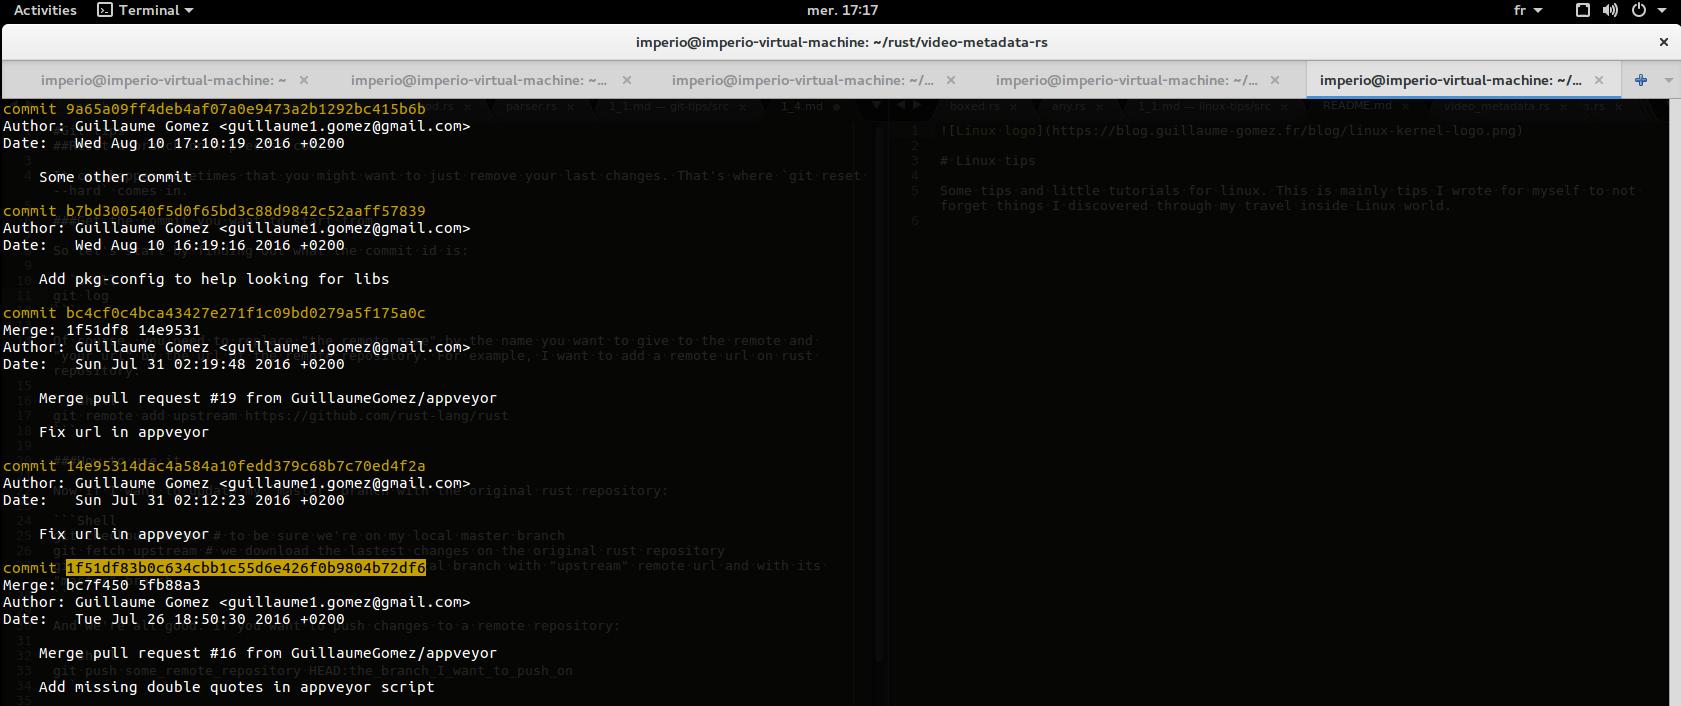 Git log